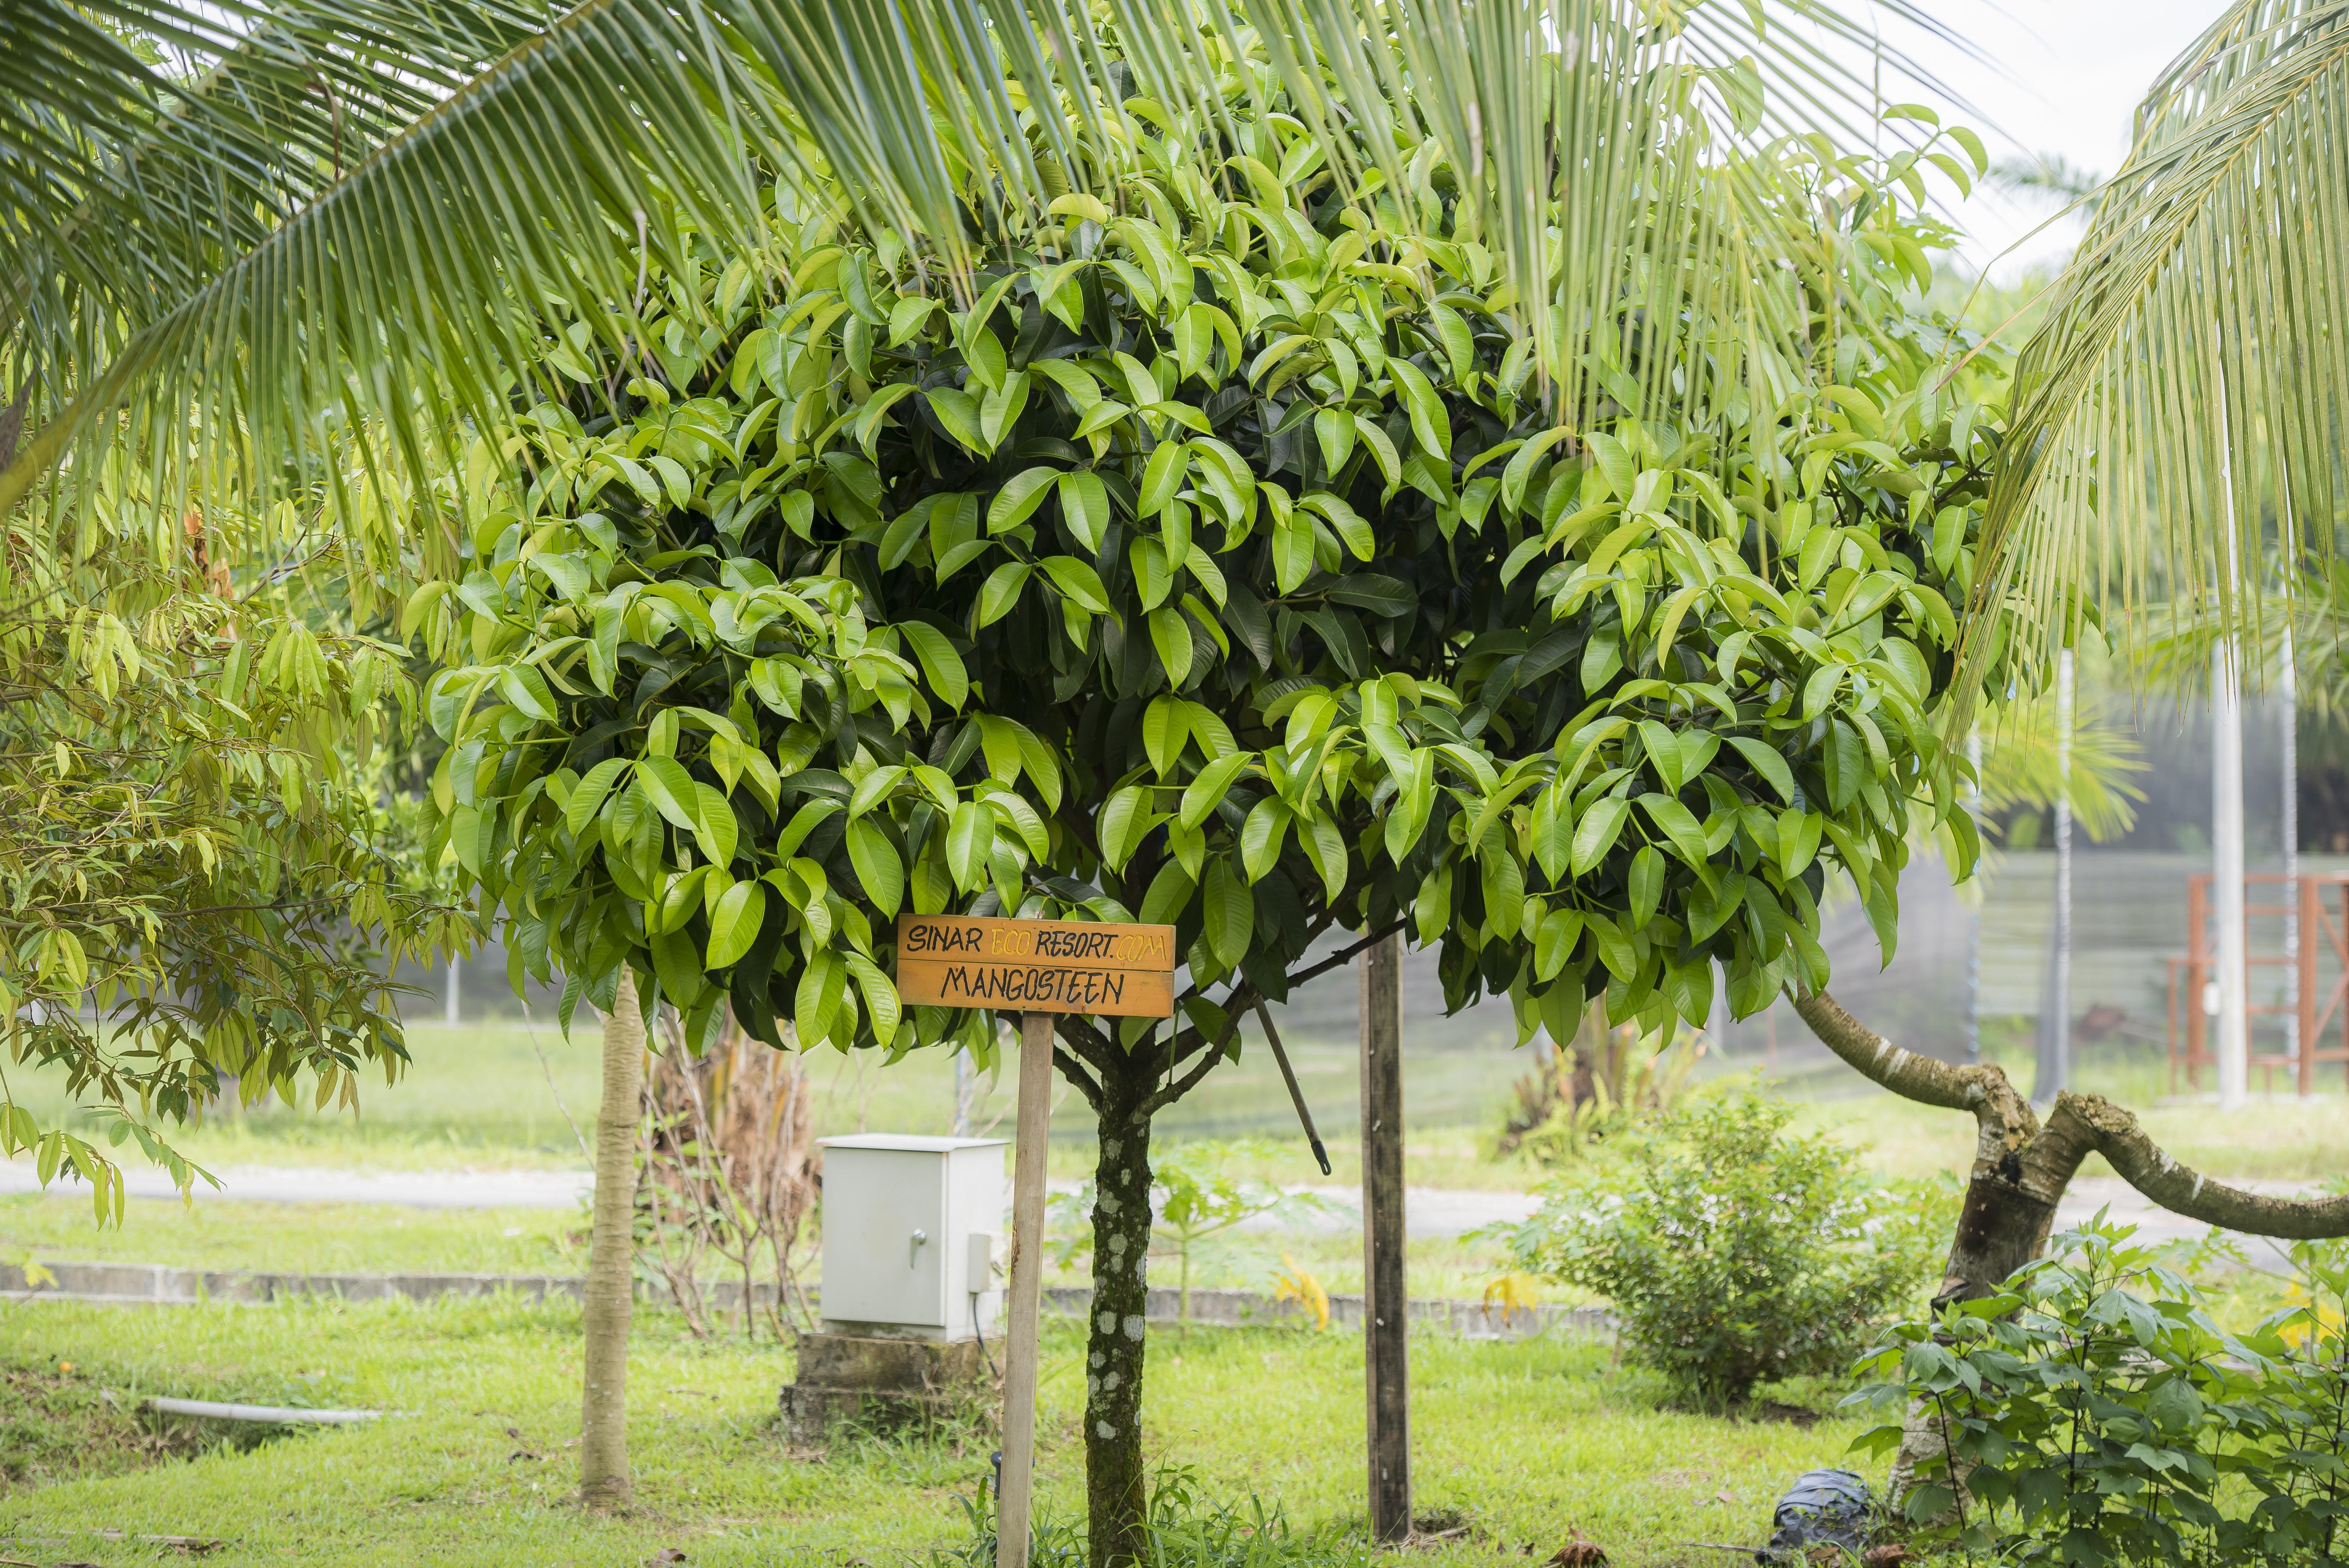 Mangosteen tree